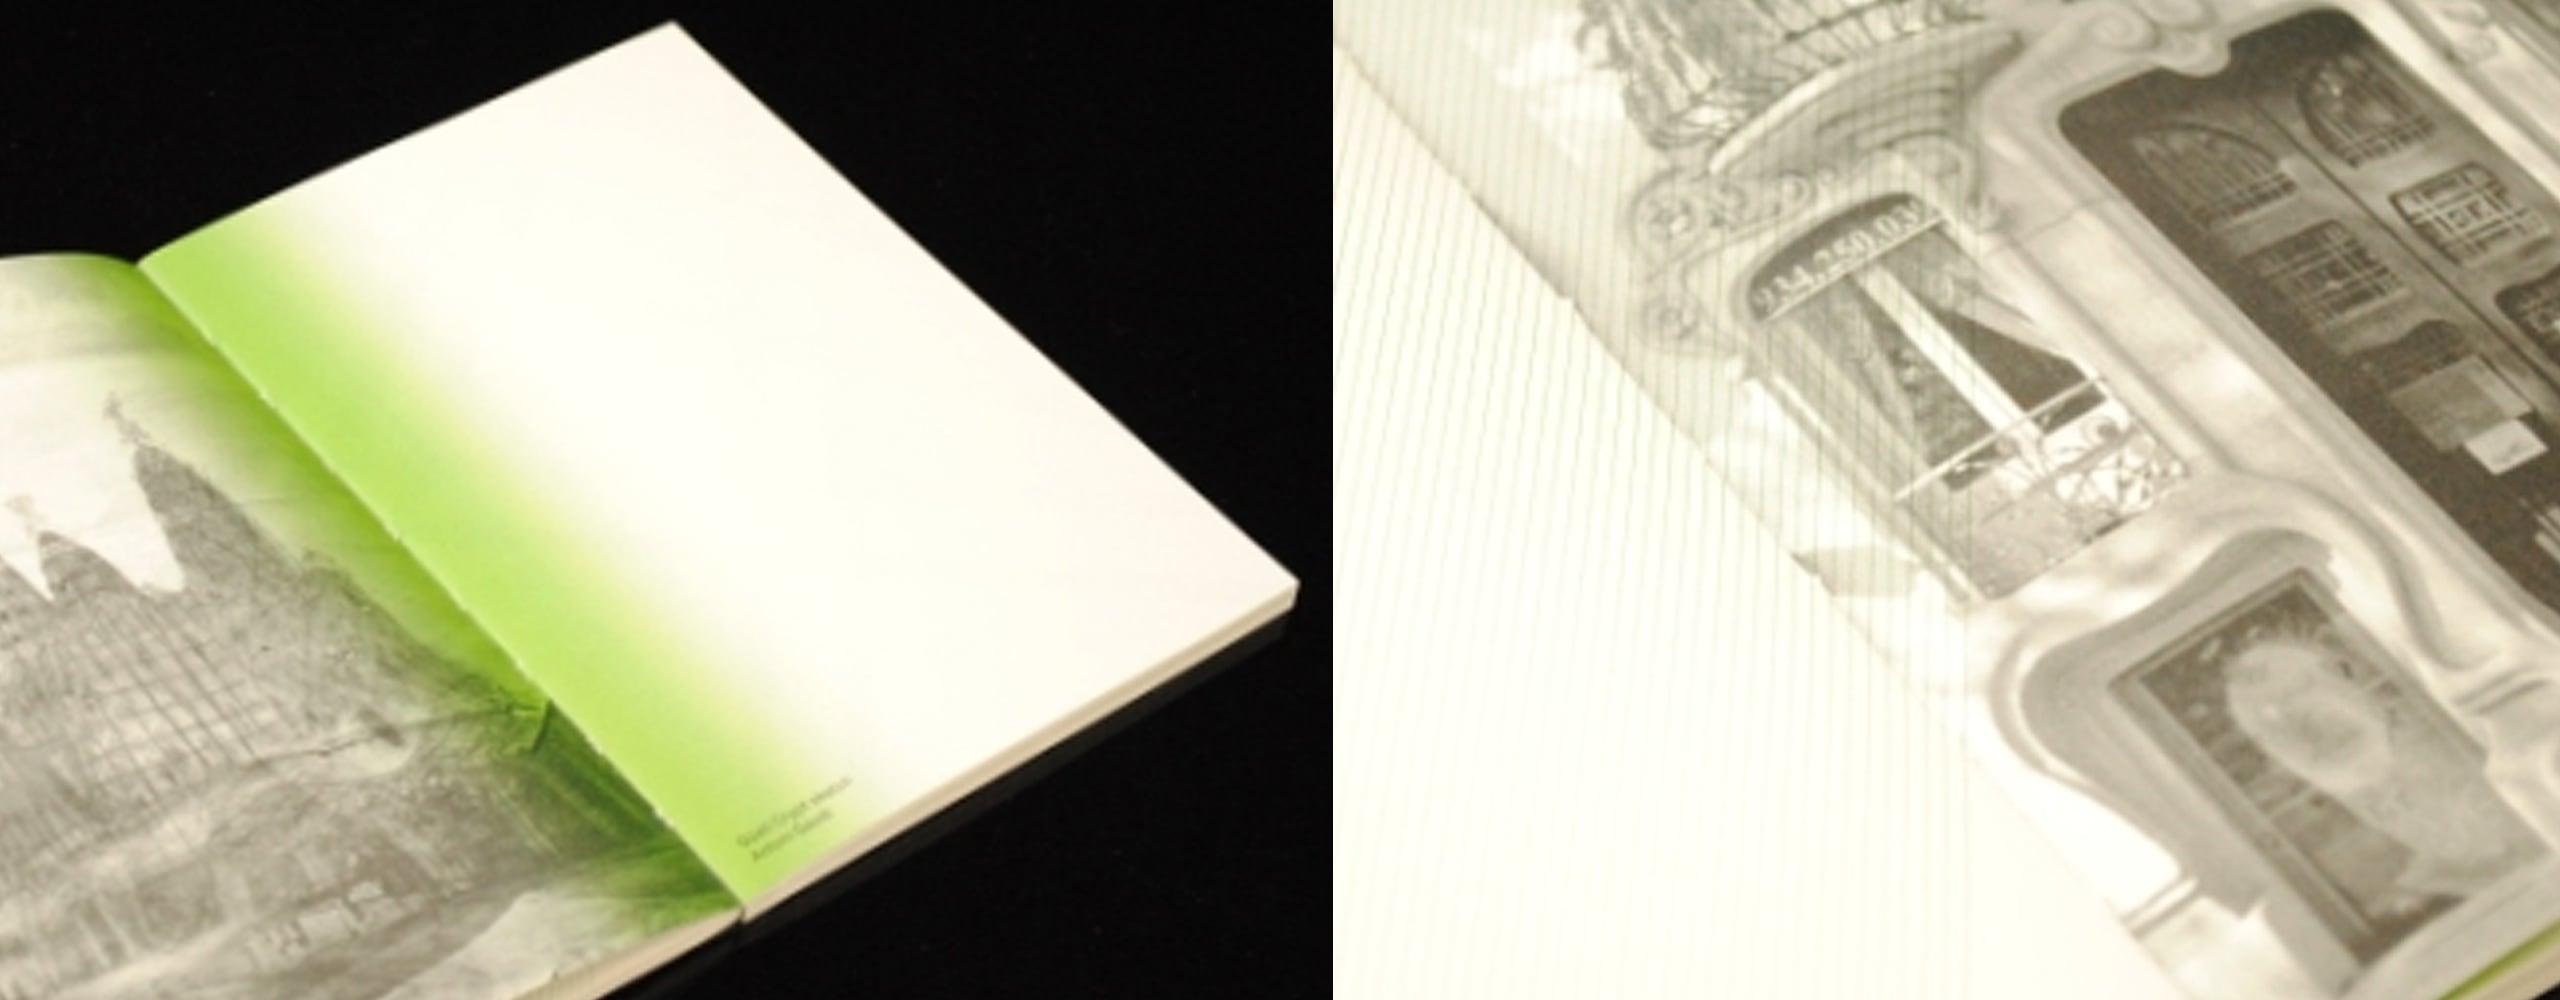 Nike Woven Notebook marketing materials details